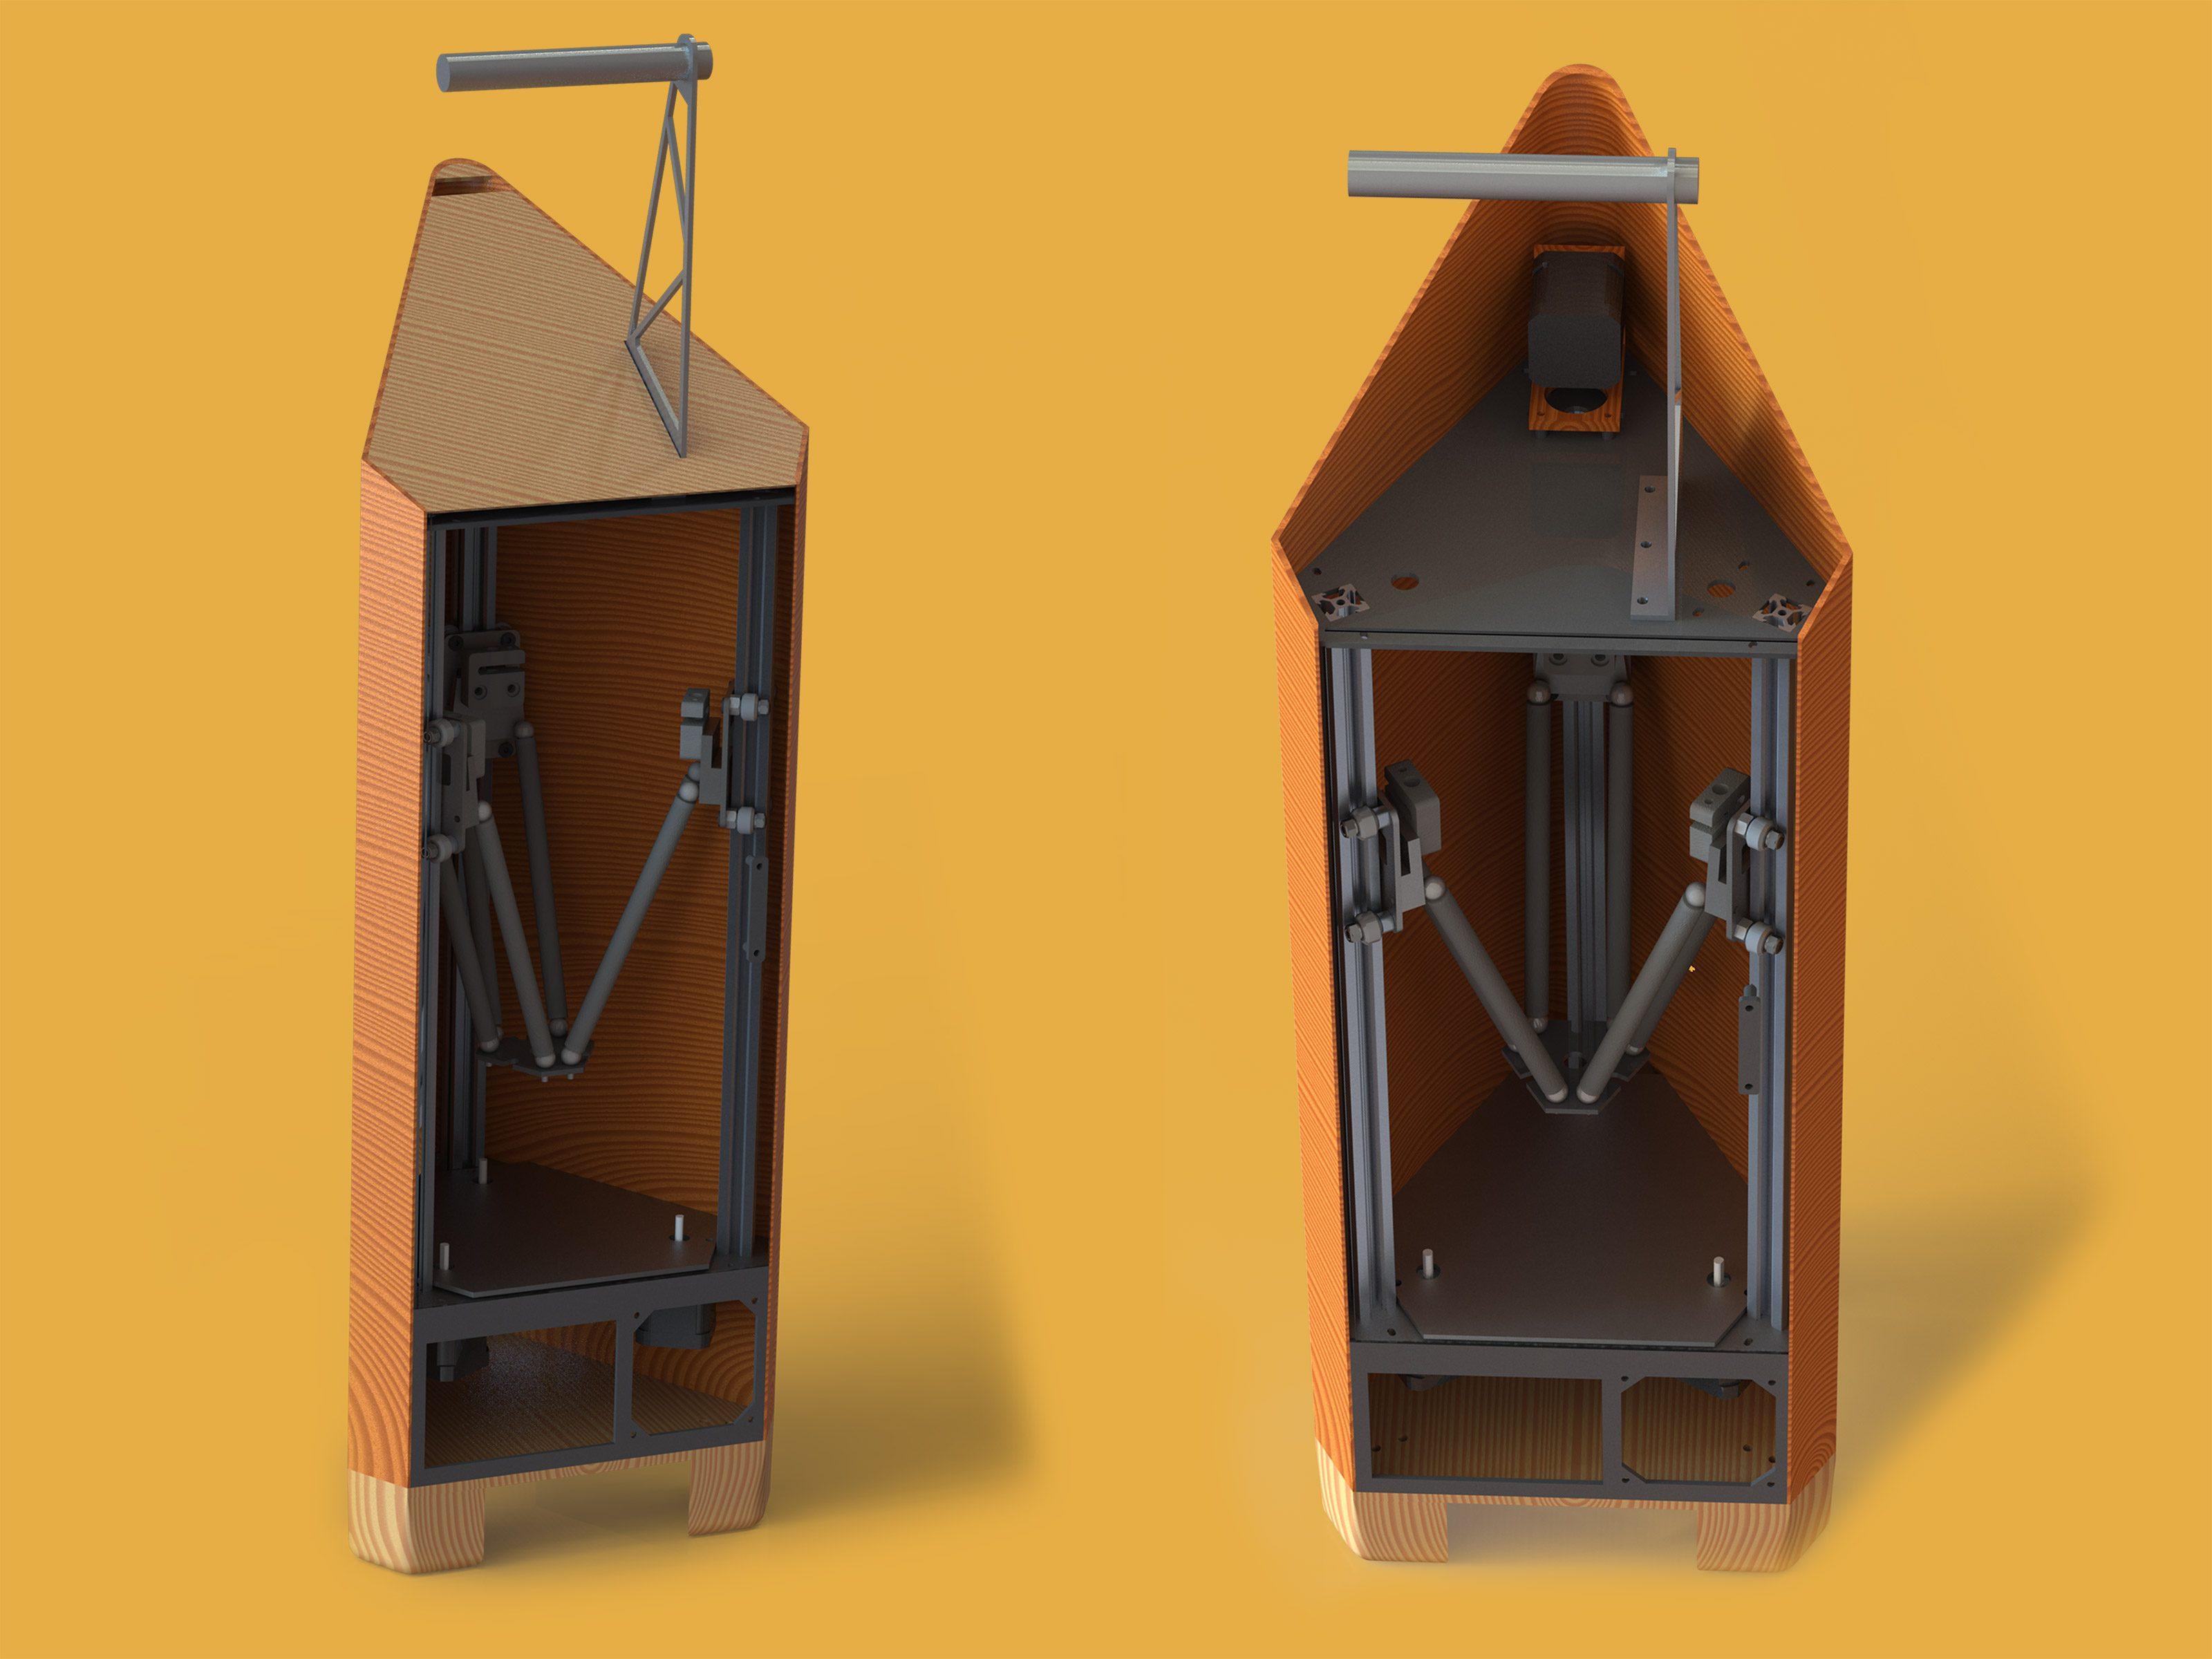 Final renders - Made in SW Visualise